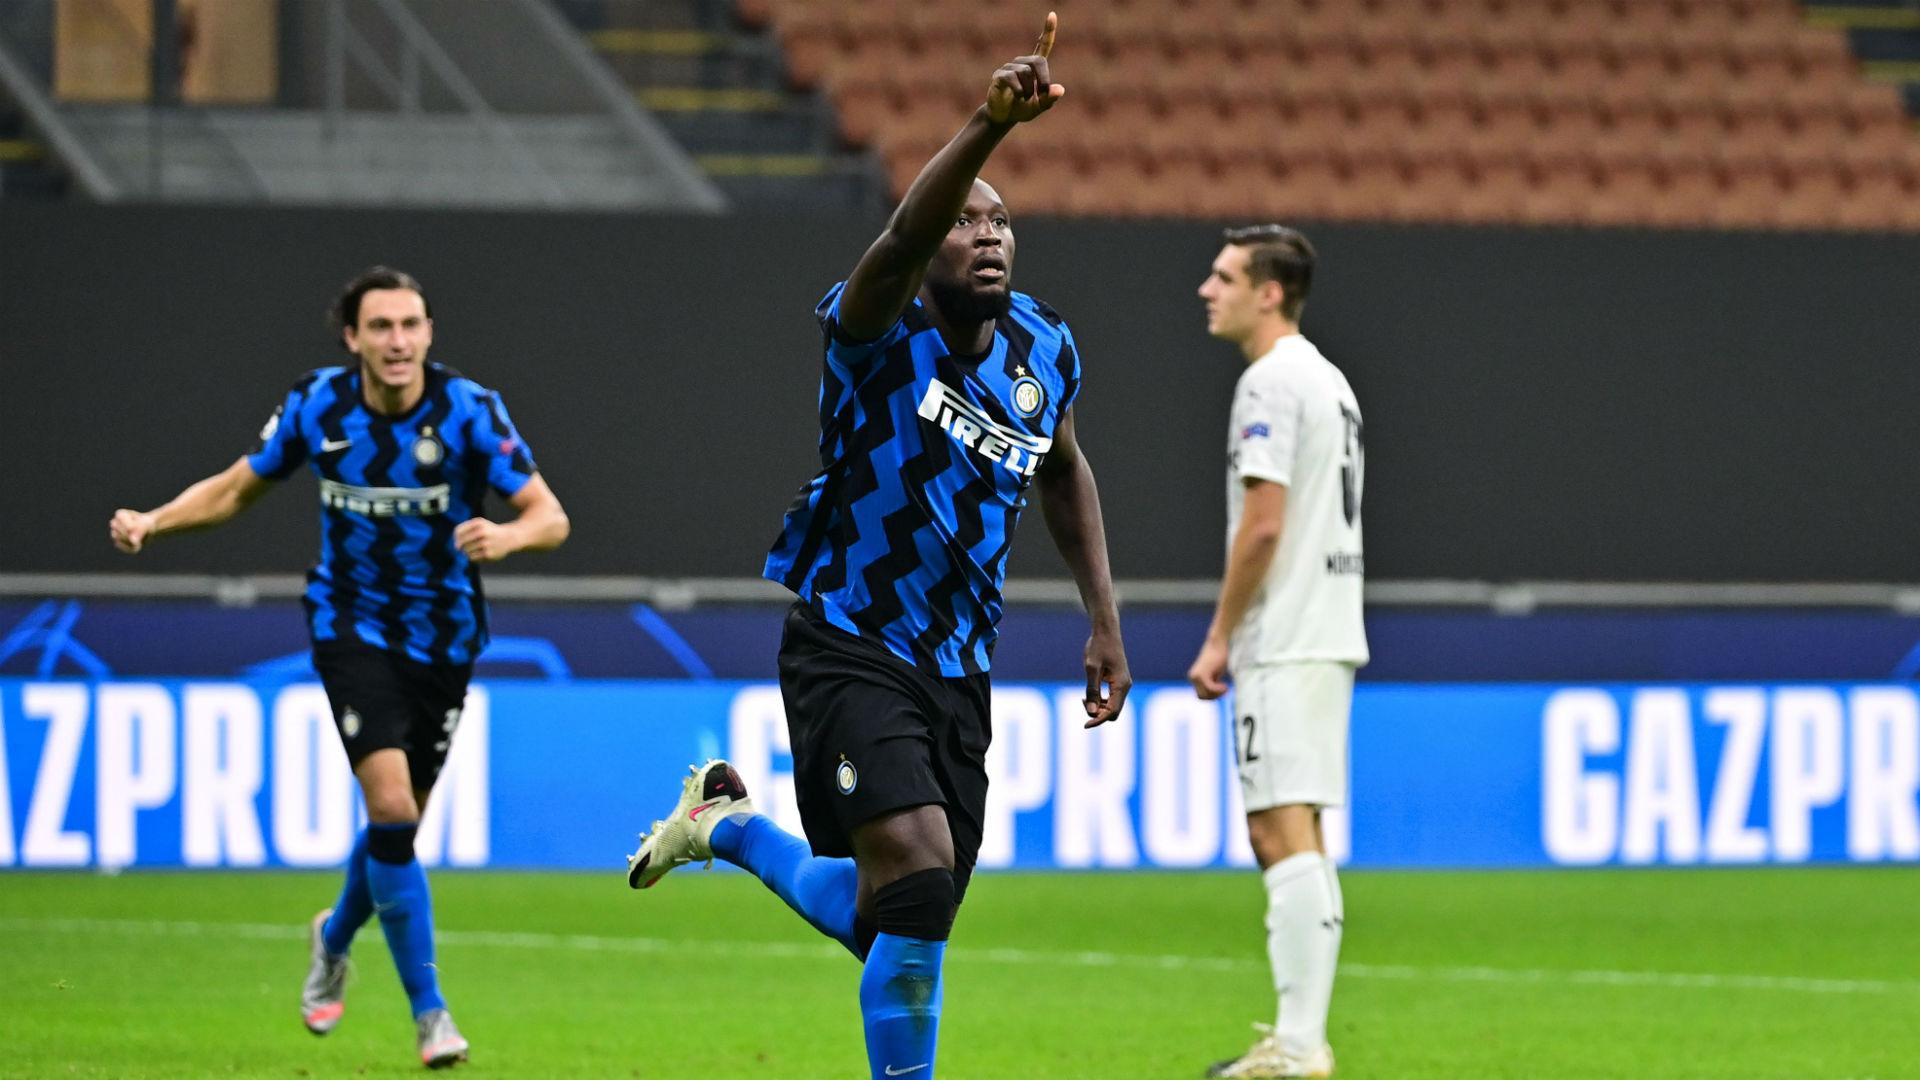 Laporan Pertandingan Inter Milan Vs Borussia Monchengladbach Goal Com